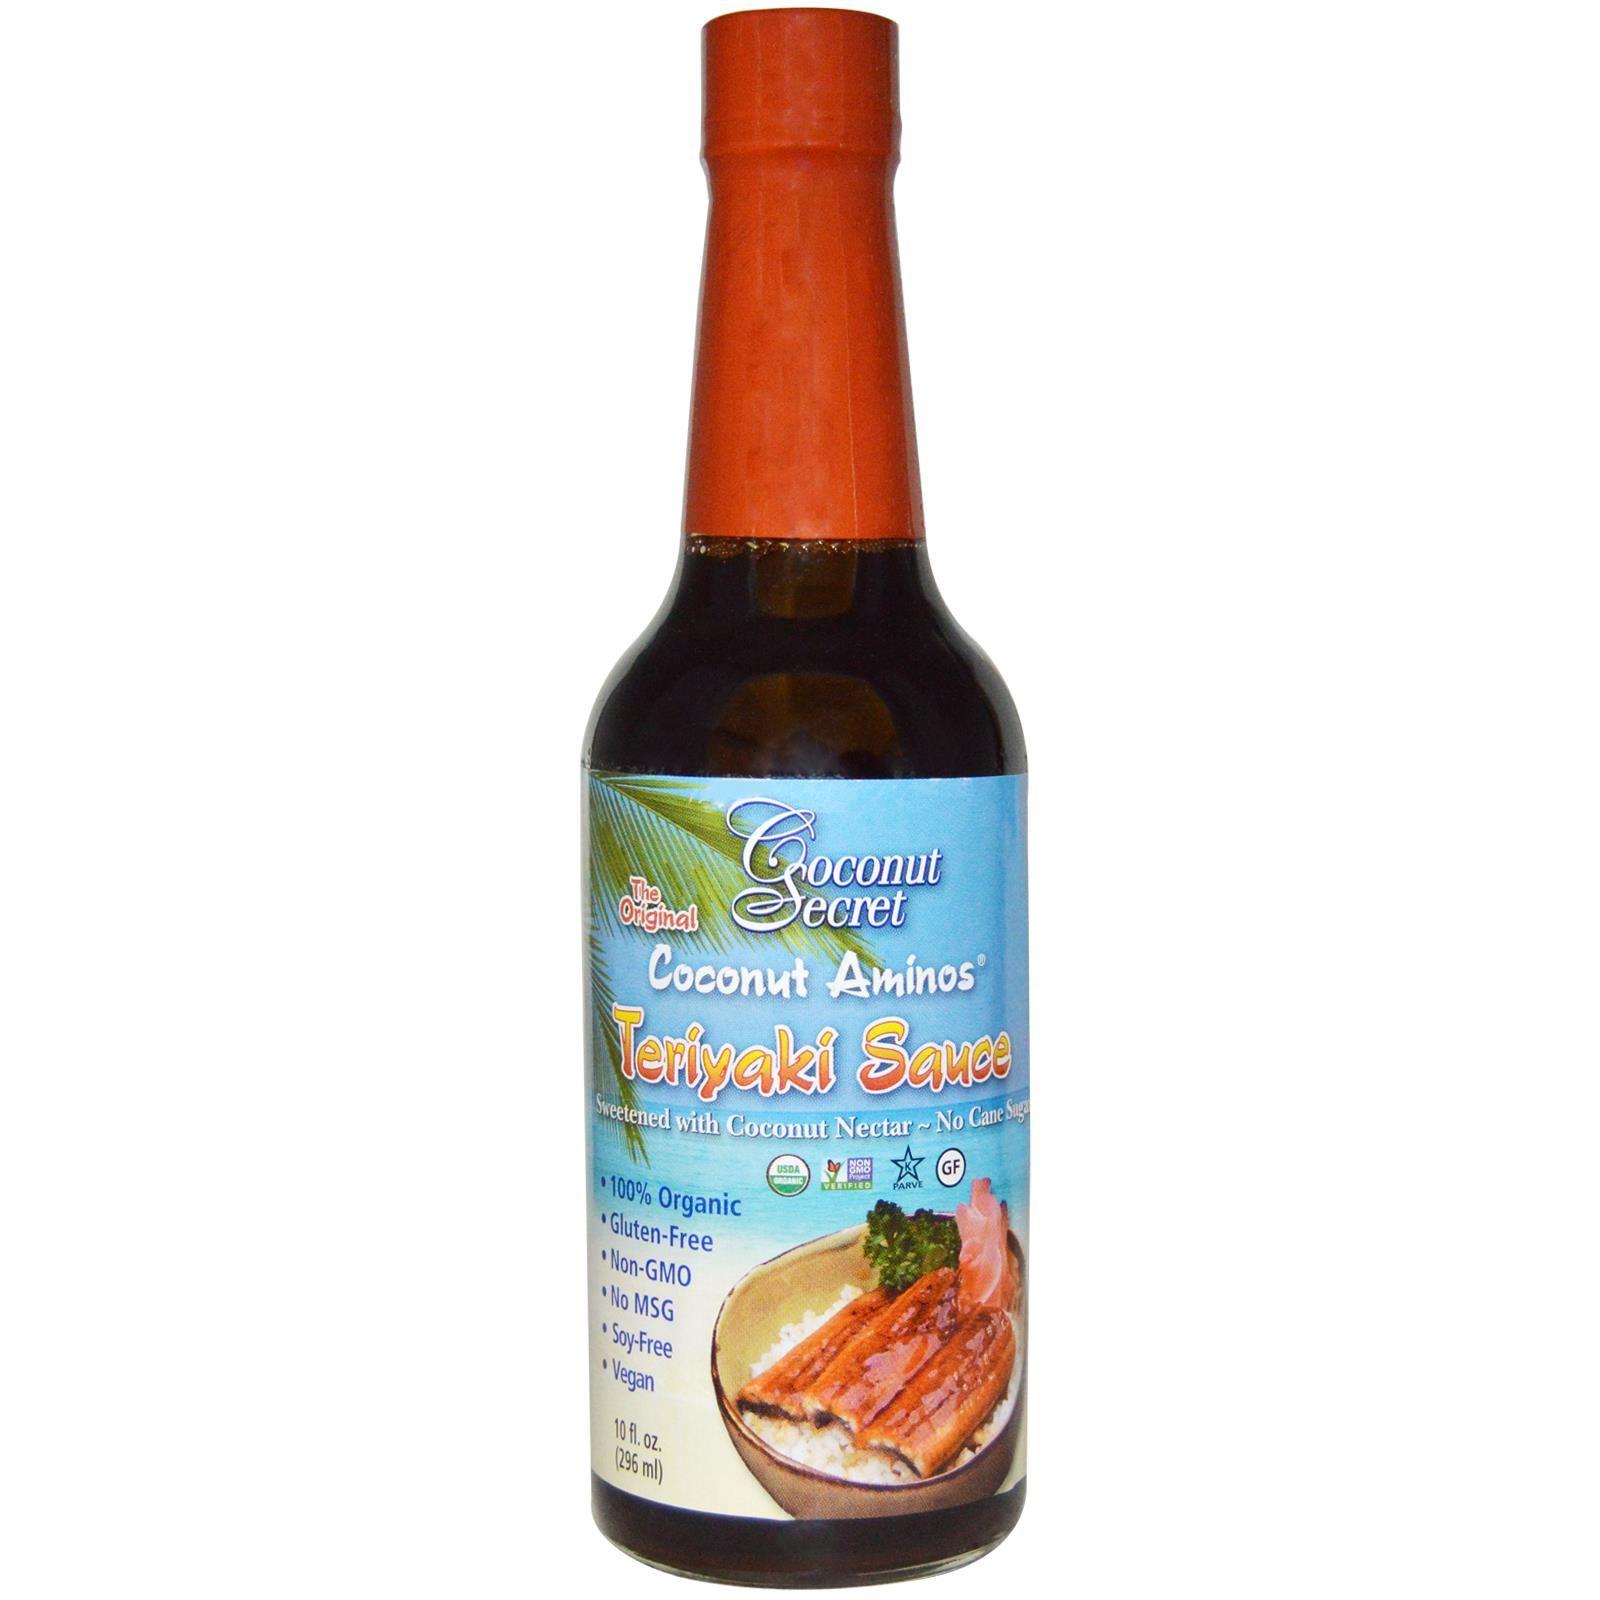 Coconut Secret, Teriyaki Sauce, Coconut Aminos, 10 fl oz (296 ml) - iHerb.com